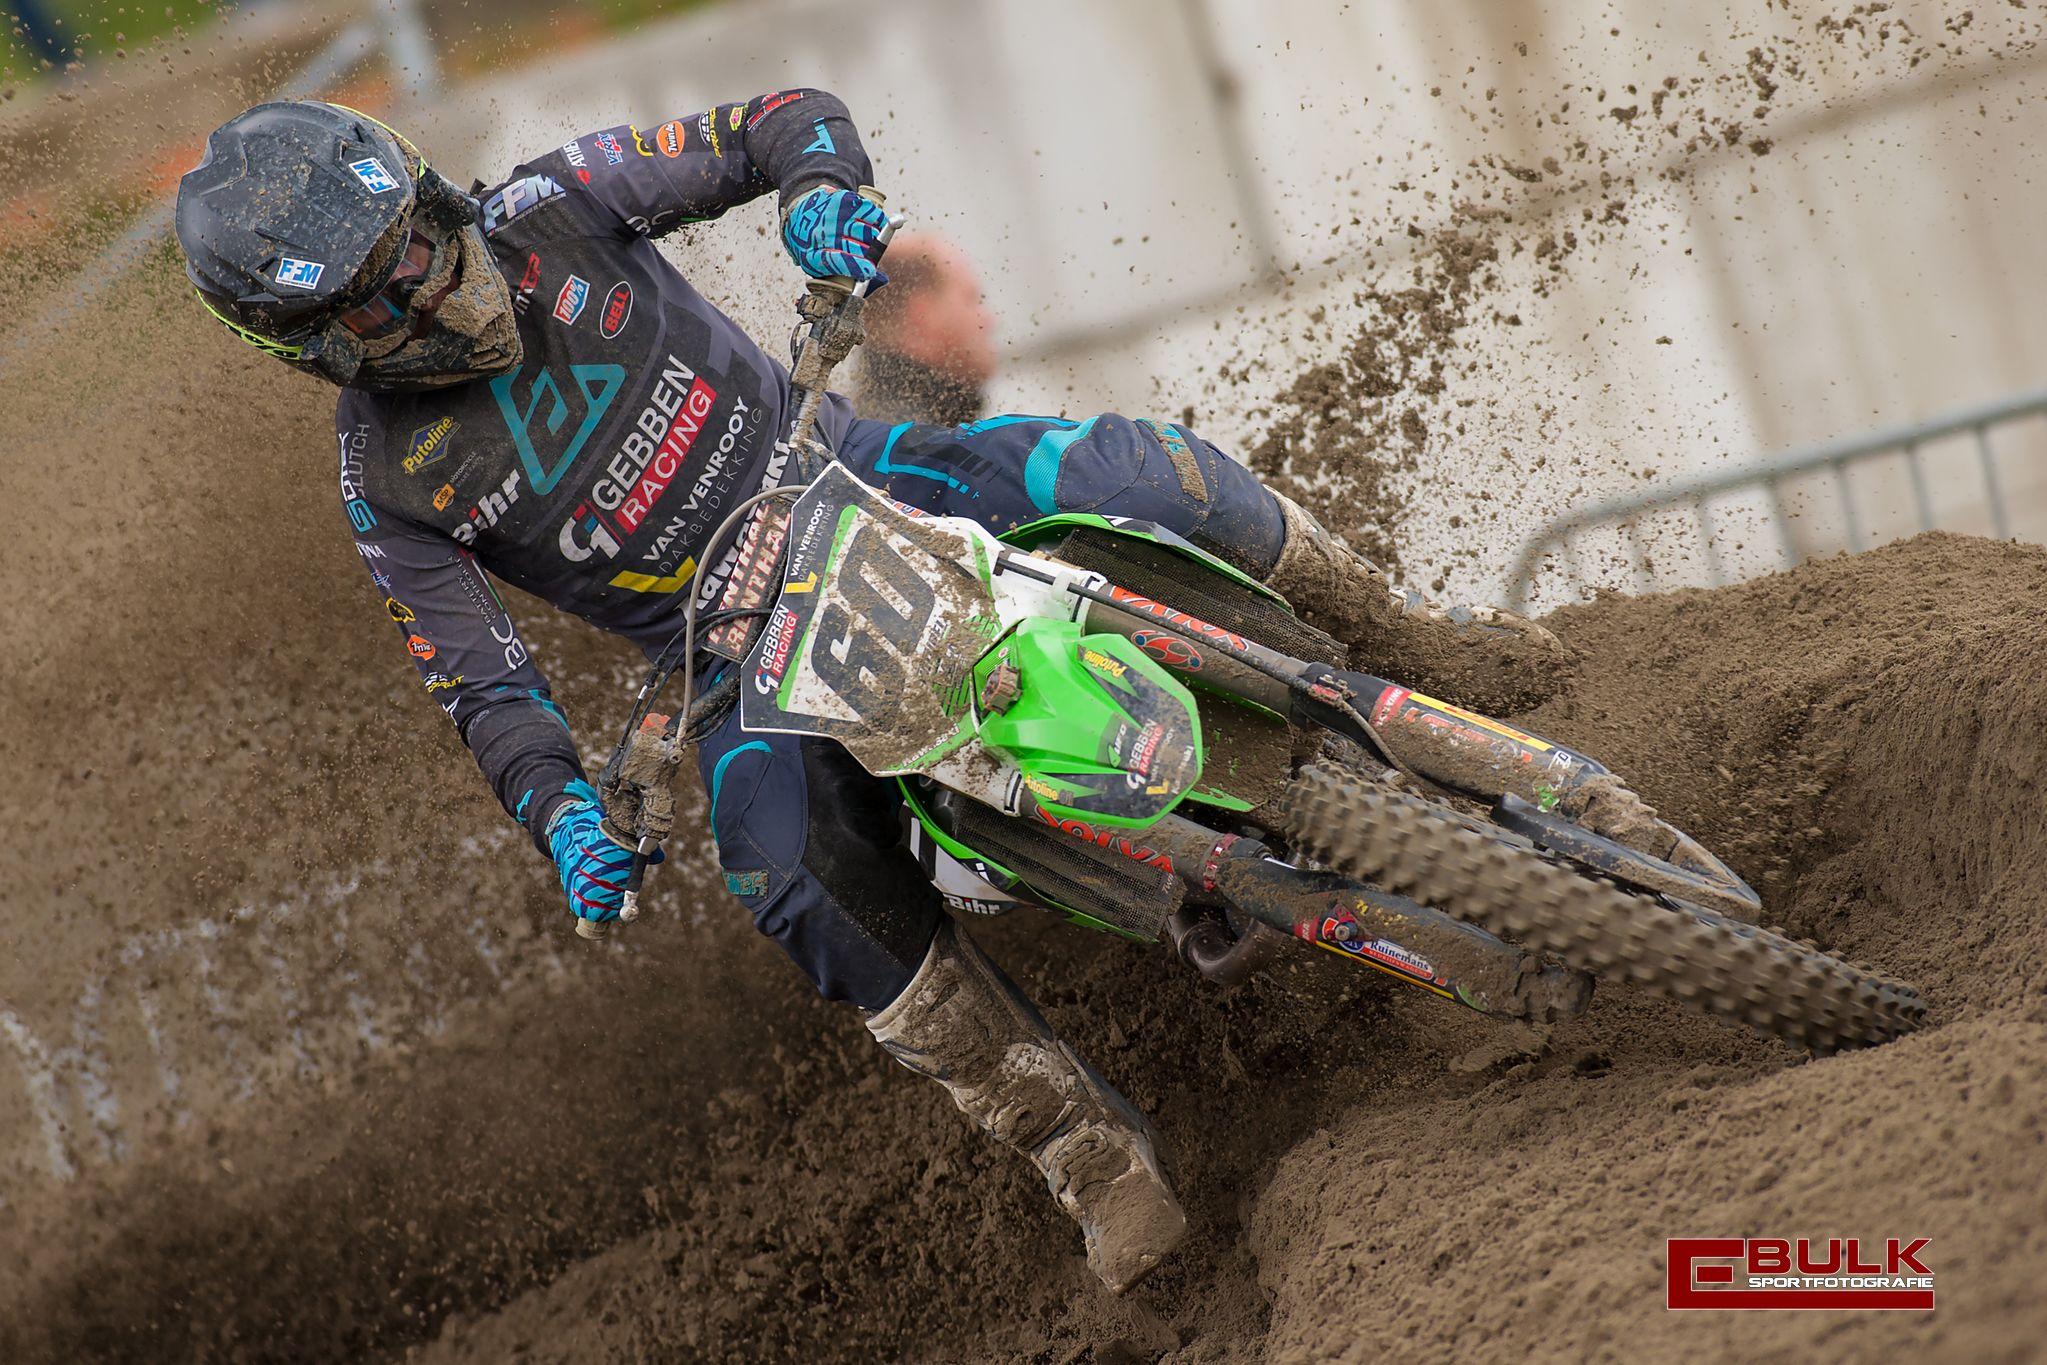 ebs_0465-ed_bulk_sportfotografie